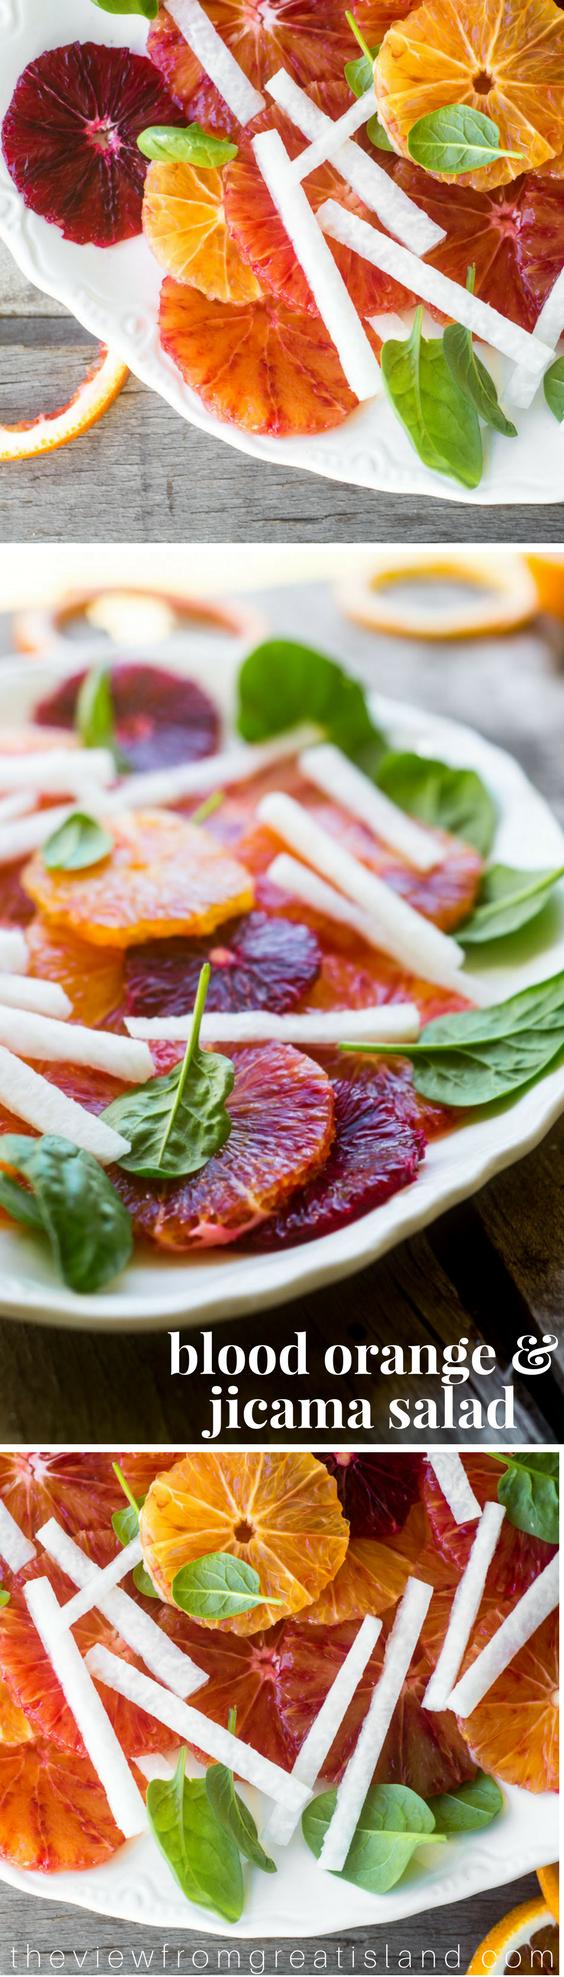 Blood Orange and Jicama Salad is a refreshing mix of juicy citrus and crunchy jicama --- #citrus #bloodoranges #oranges #jicama #wintersalad #salad #orangesalad #healthy #paleo #whole30 #glutenfree #lowcalorie #weightwatchers #citrussalad #sidedish